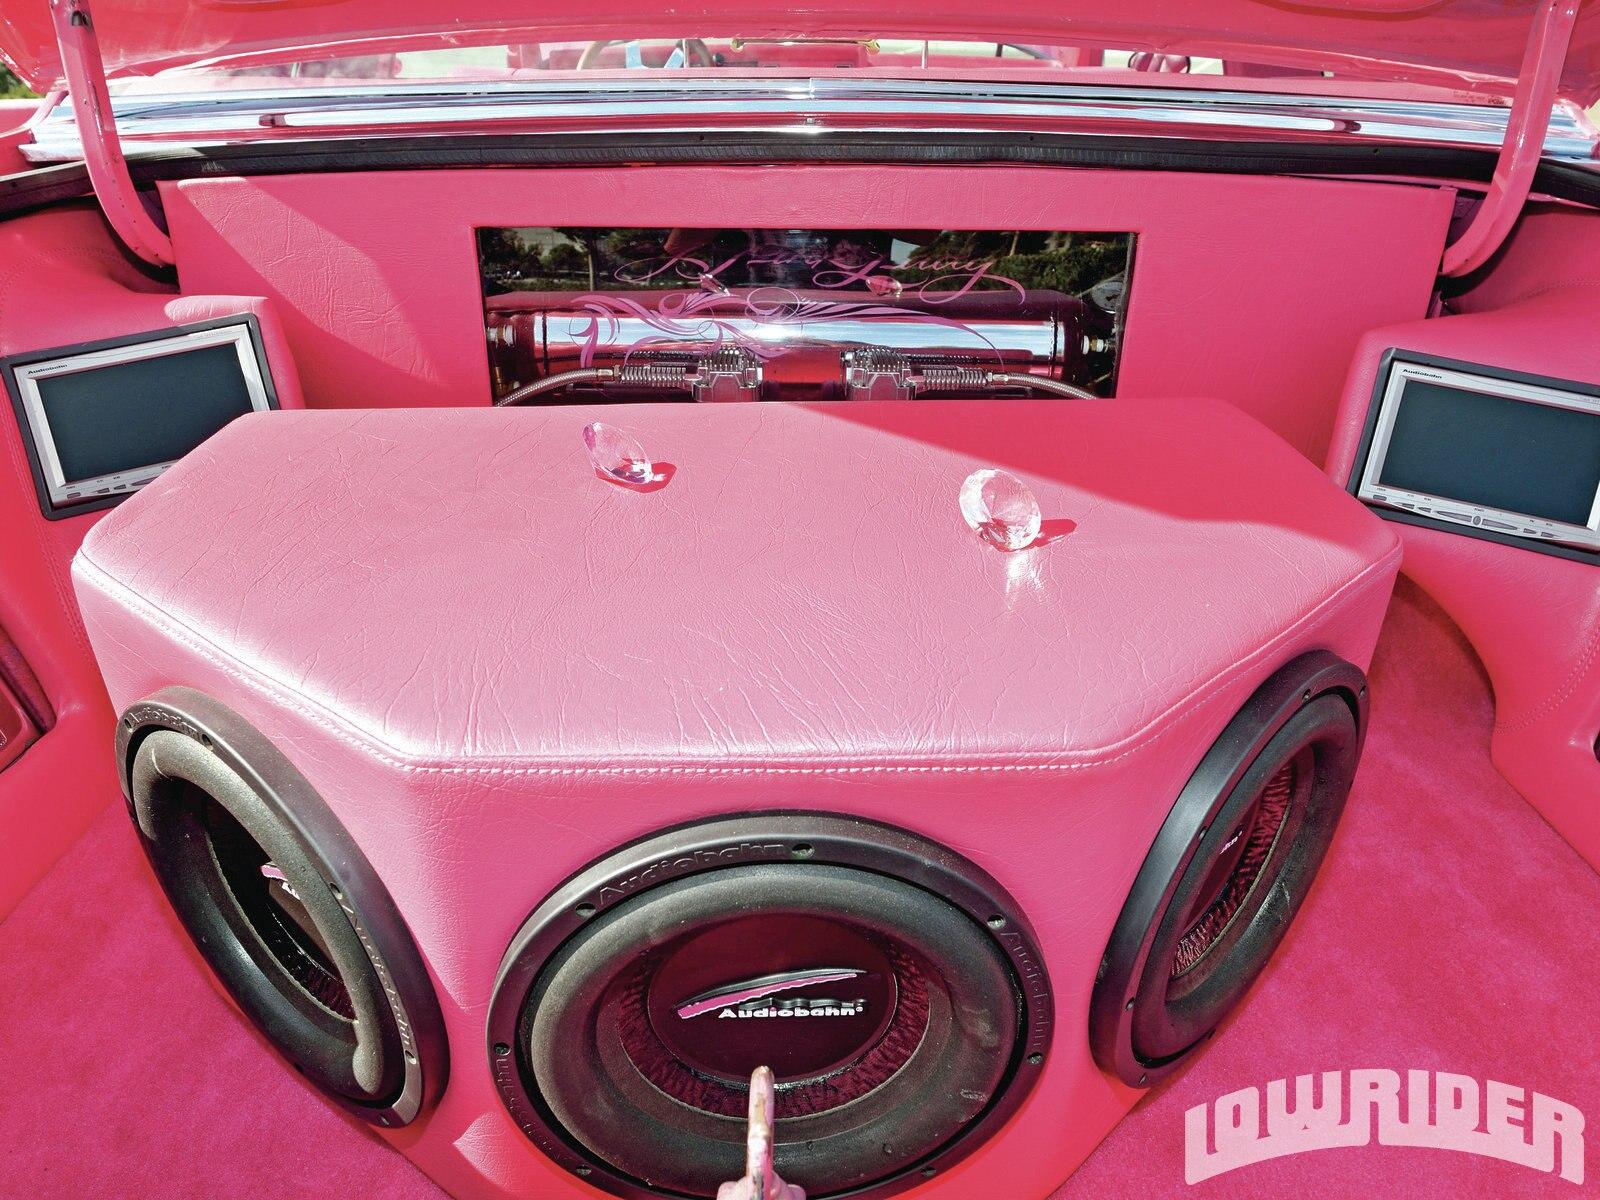 Car Stereo Wallpaper 1983 Oldsmobile Cutlass Supreme Lowrider Magazine